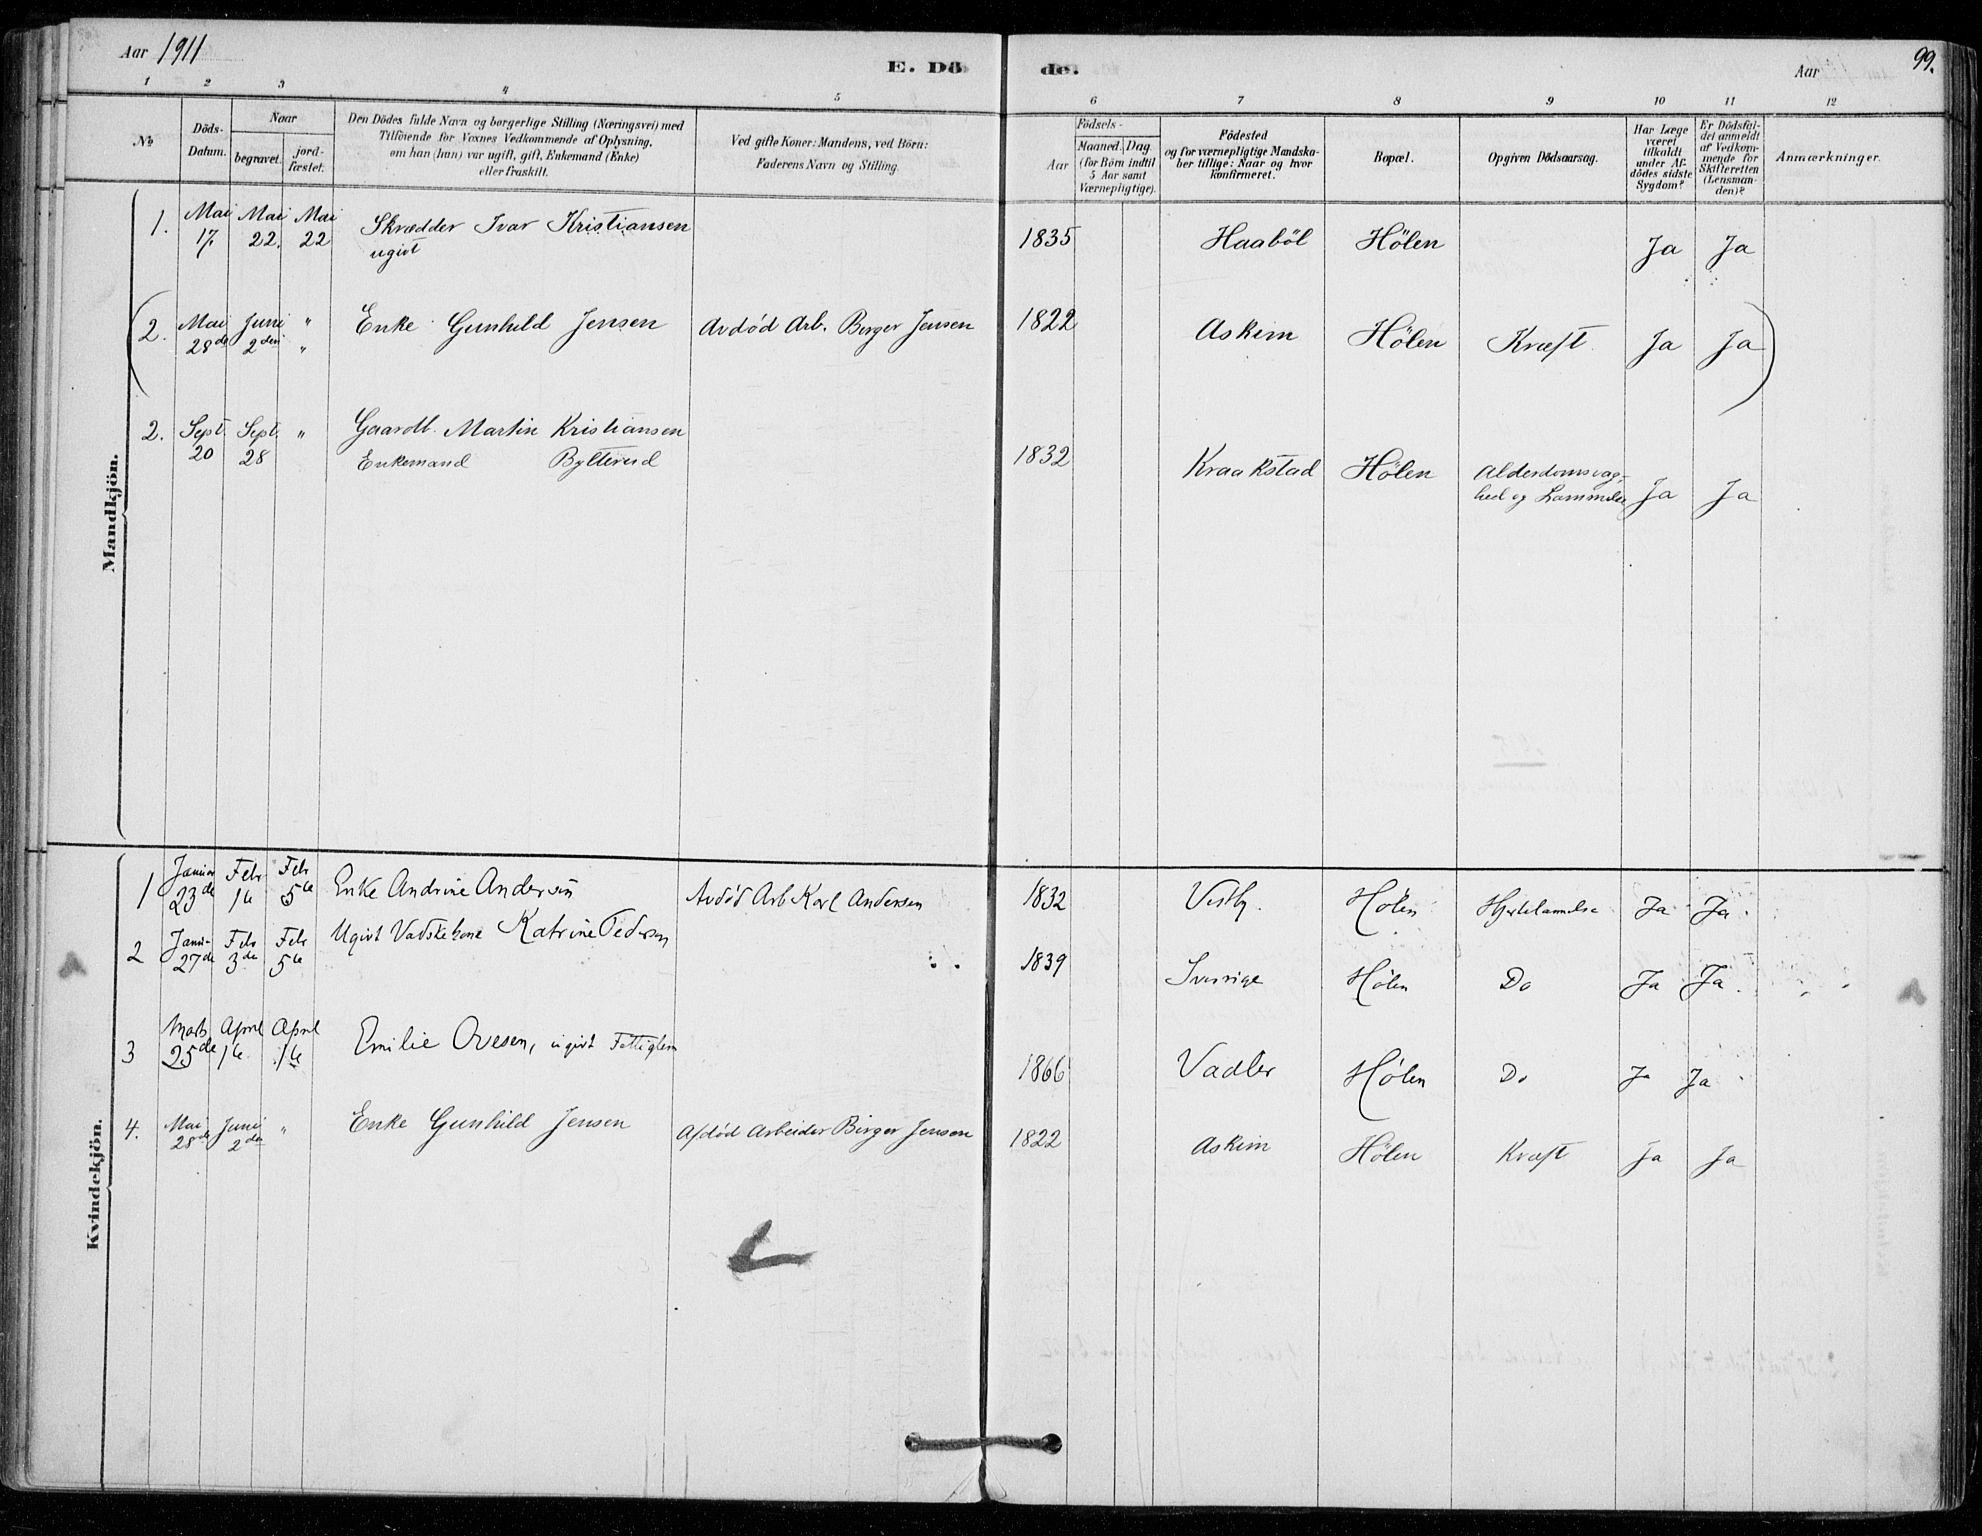 SAO, Vestby prestekontor Kirkebøker, F/Fe/L0001: Ministerialbok nr. V 1, 1878-1931, s. 99